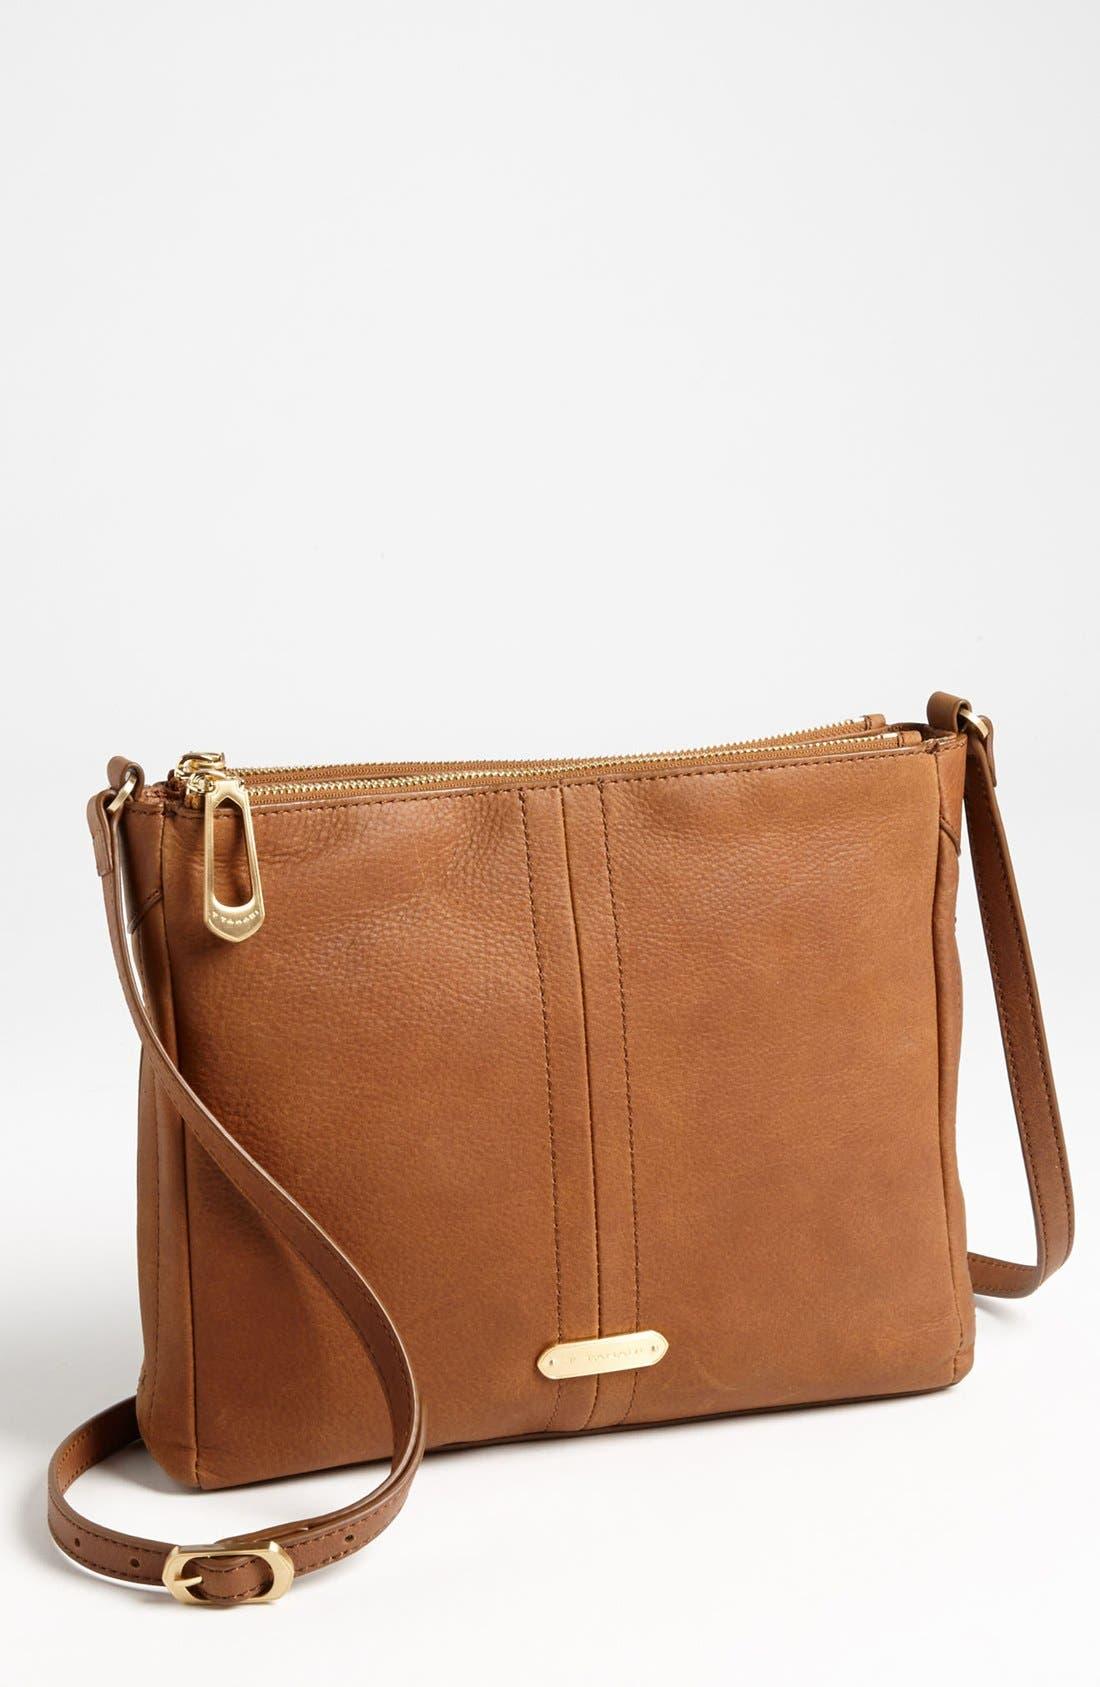 Alternate Image 1 Selected - T Tahari Pleated Double Zip Leather Crossbody Bag